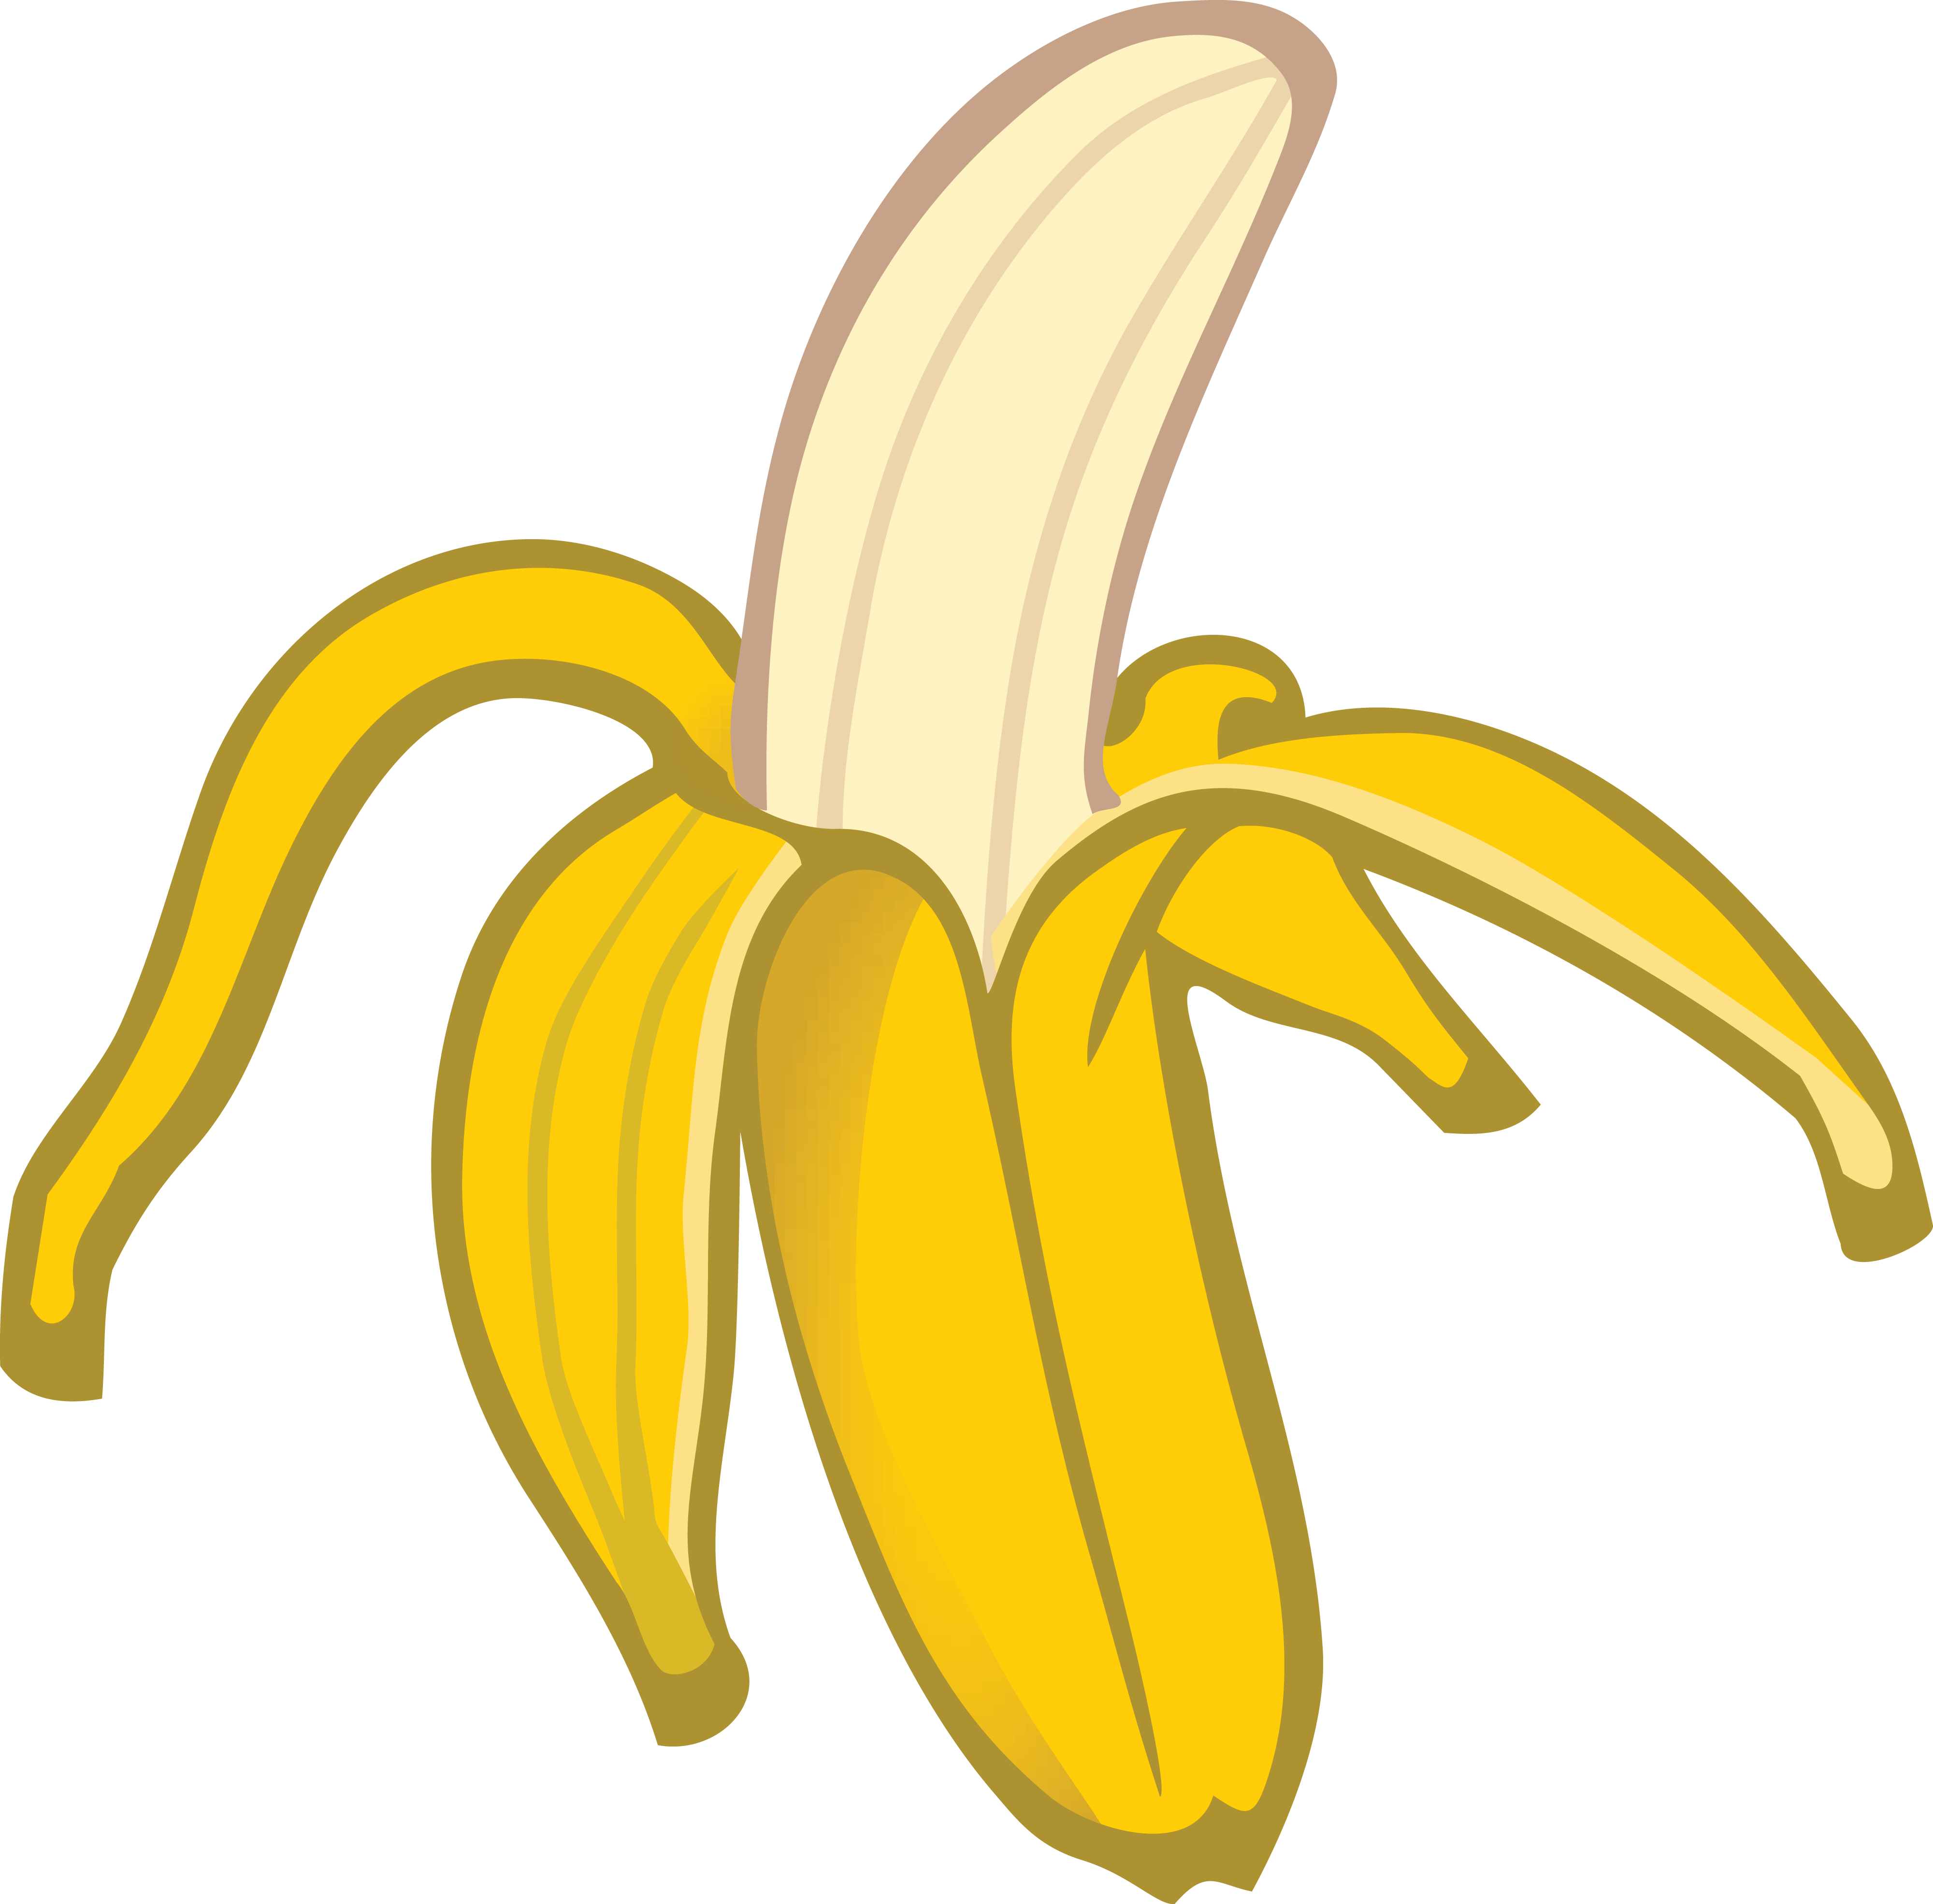 free clipart of a banana rh free clipartof com banana clip art pictures banana clip art black and white